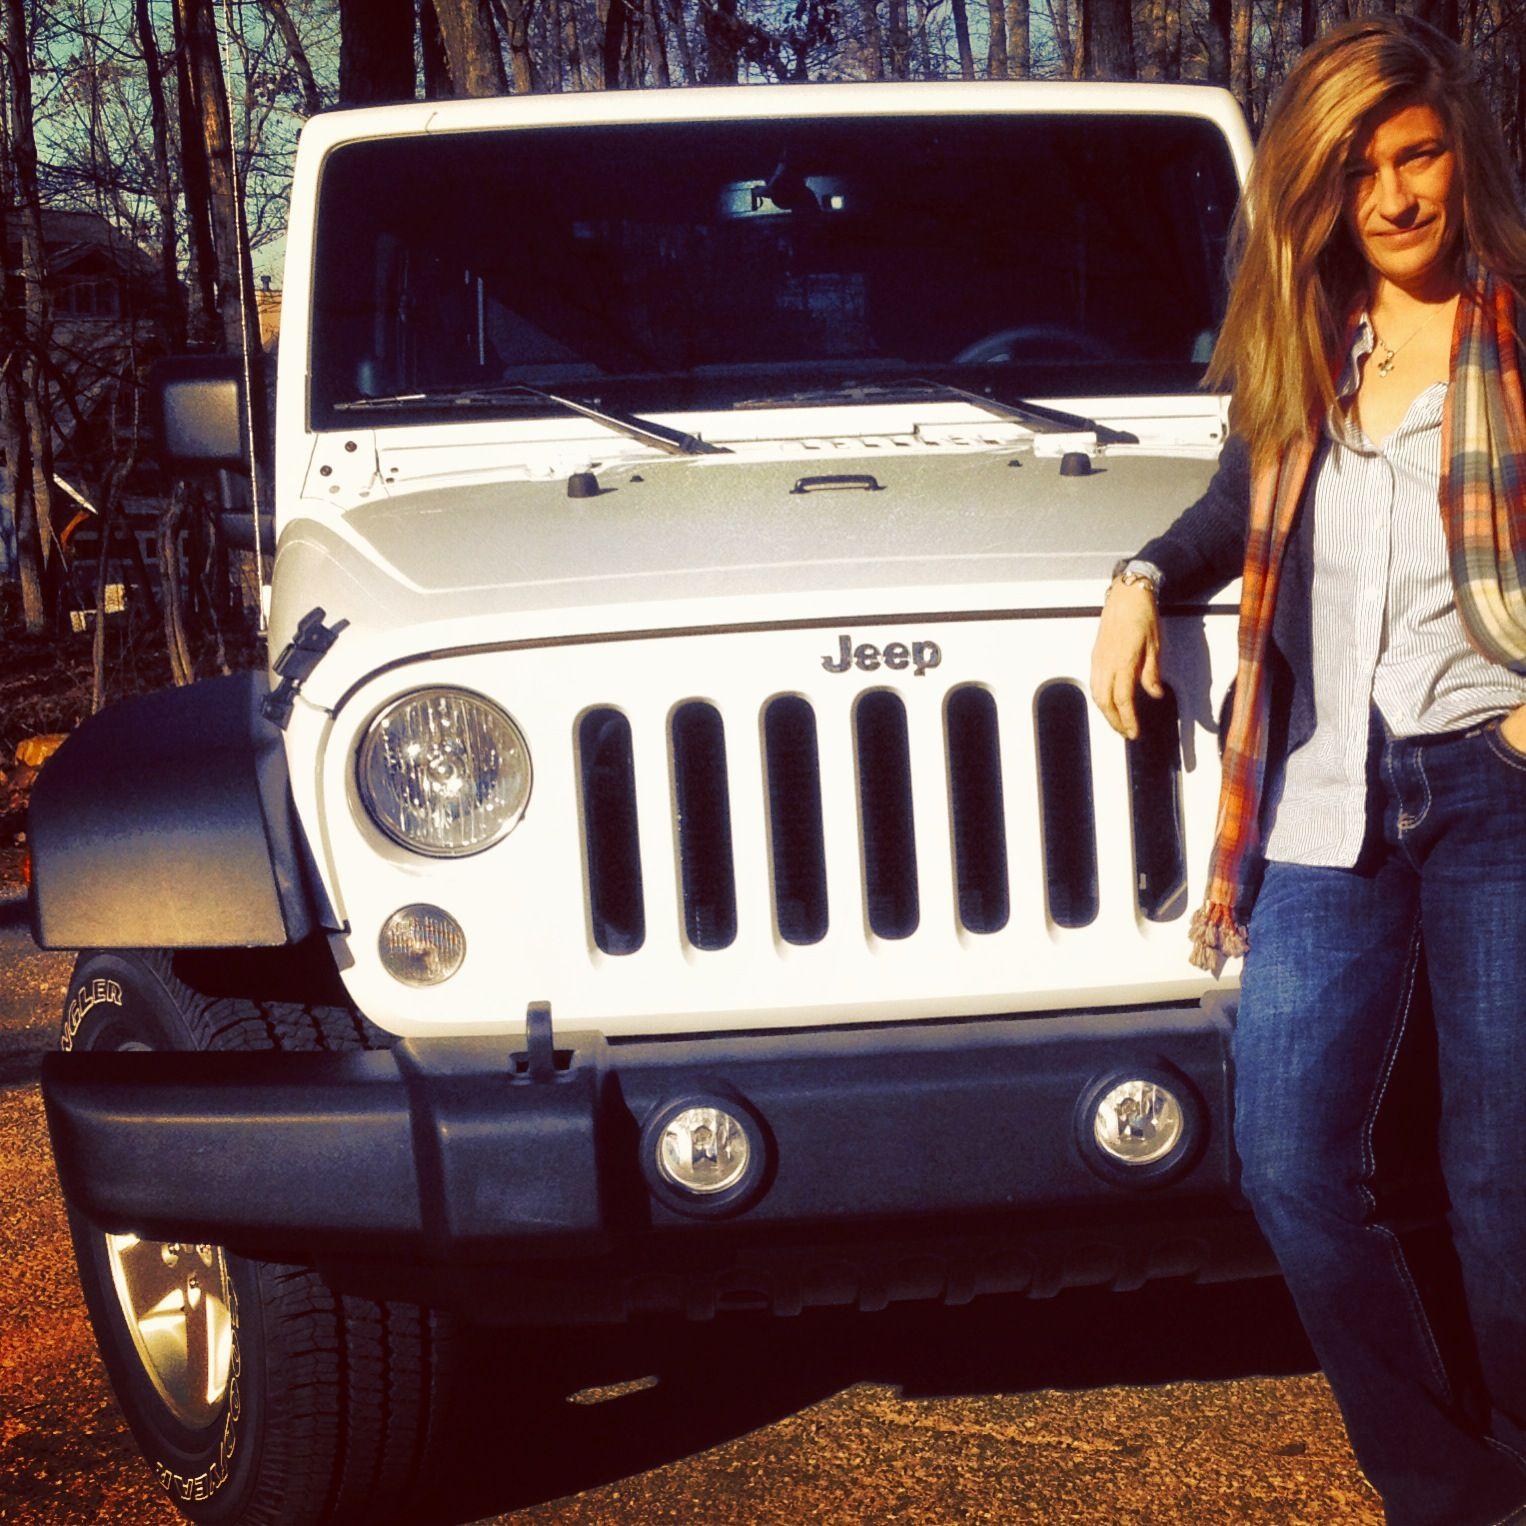 I Love my Jeep!